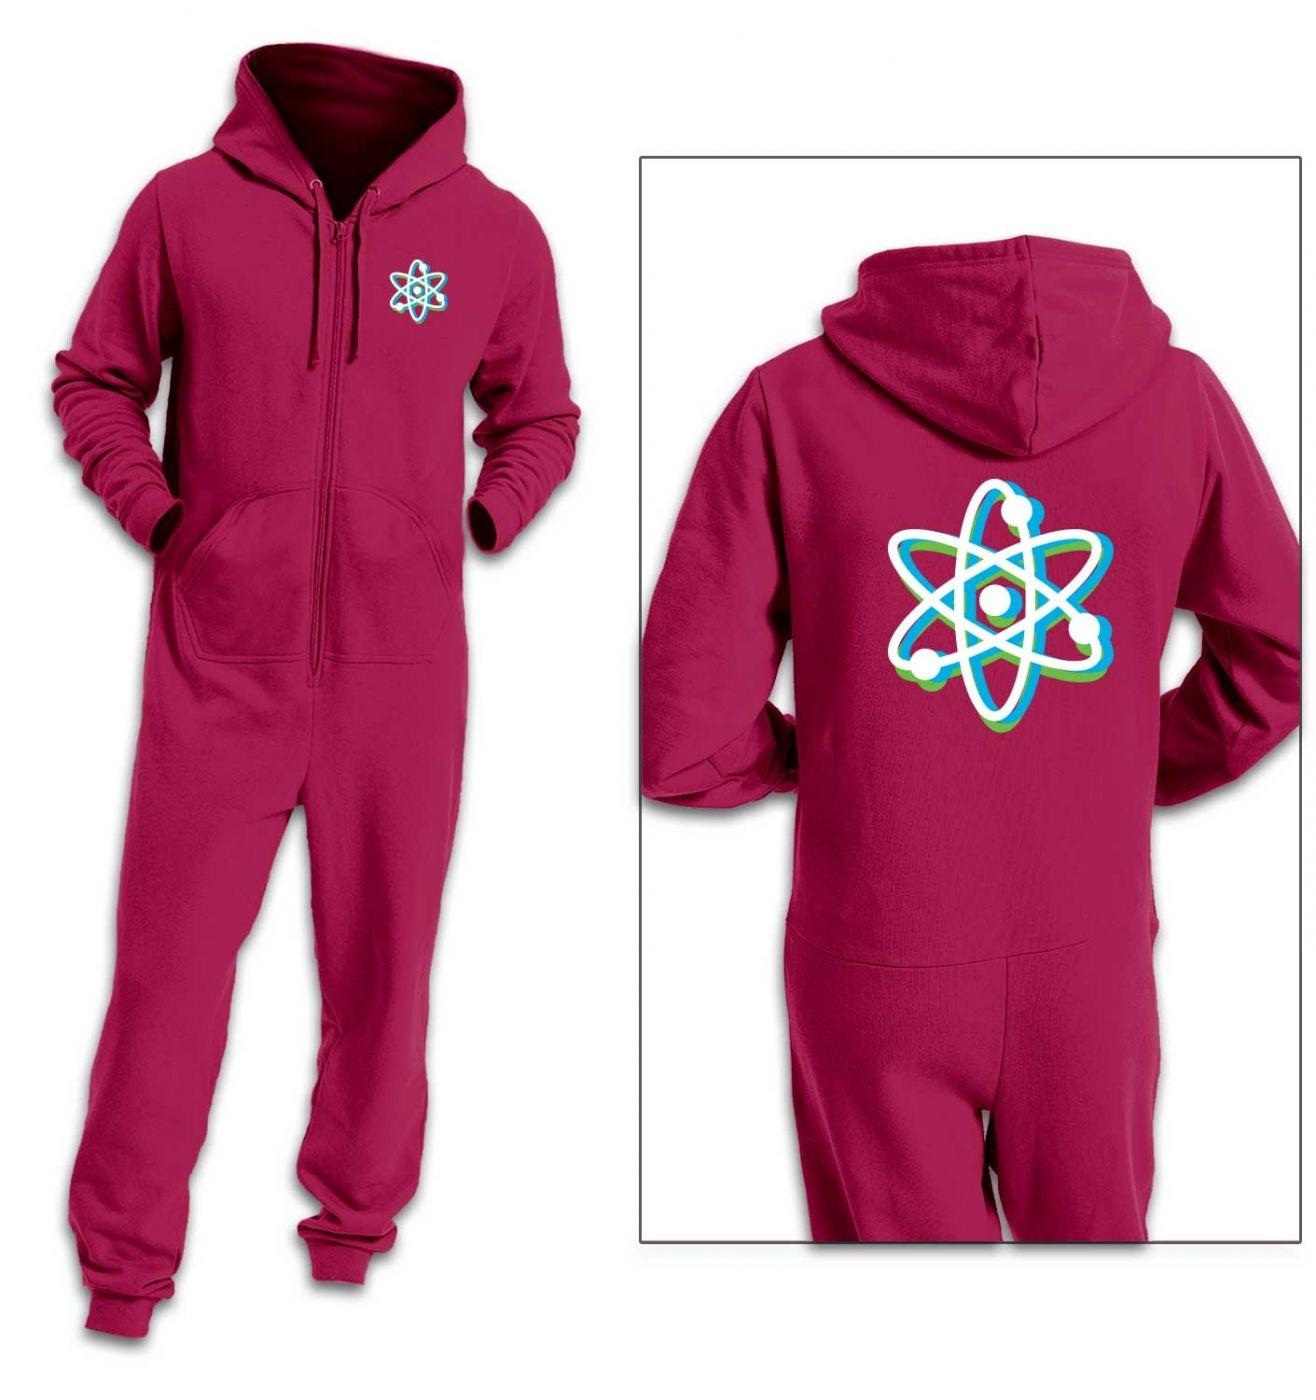 Atom onesie